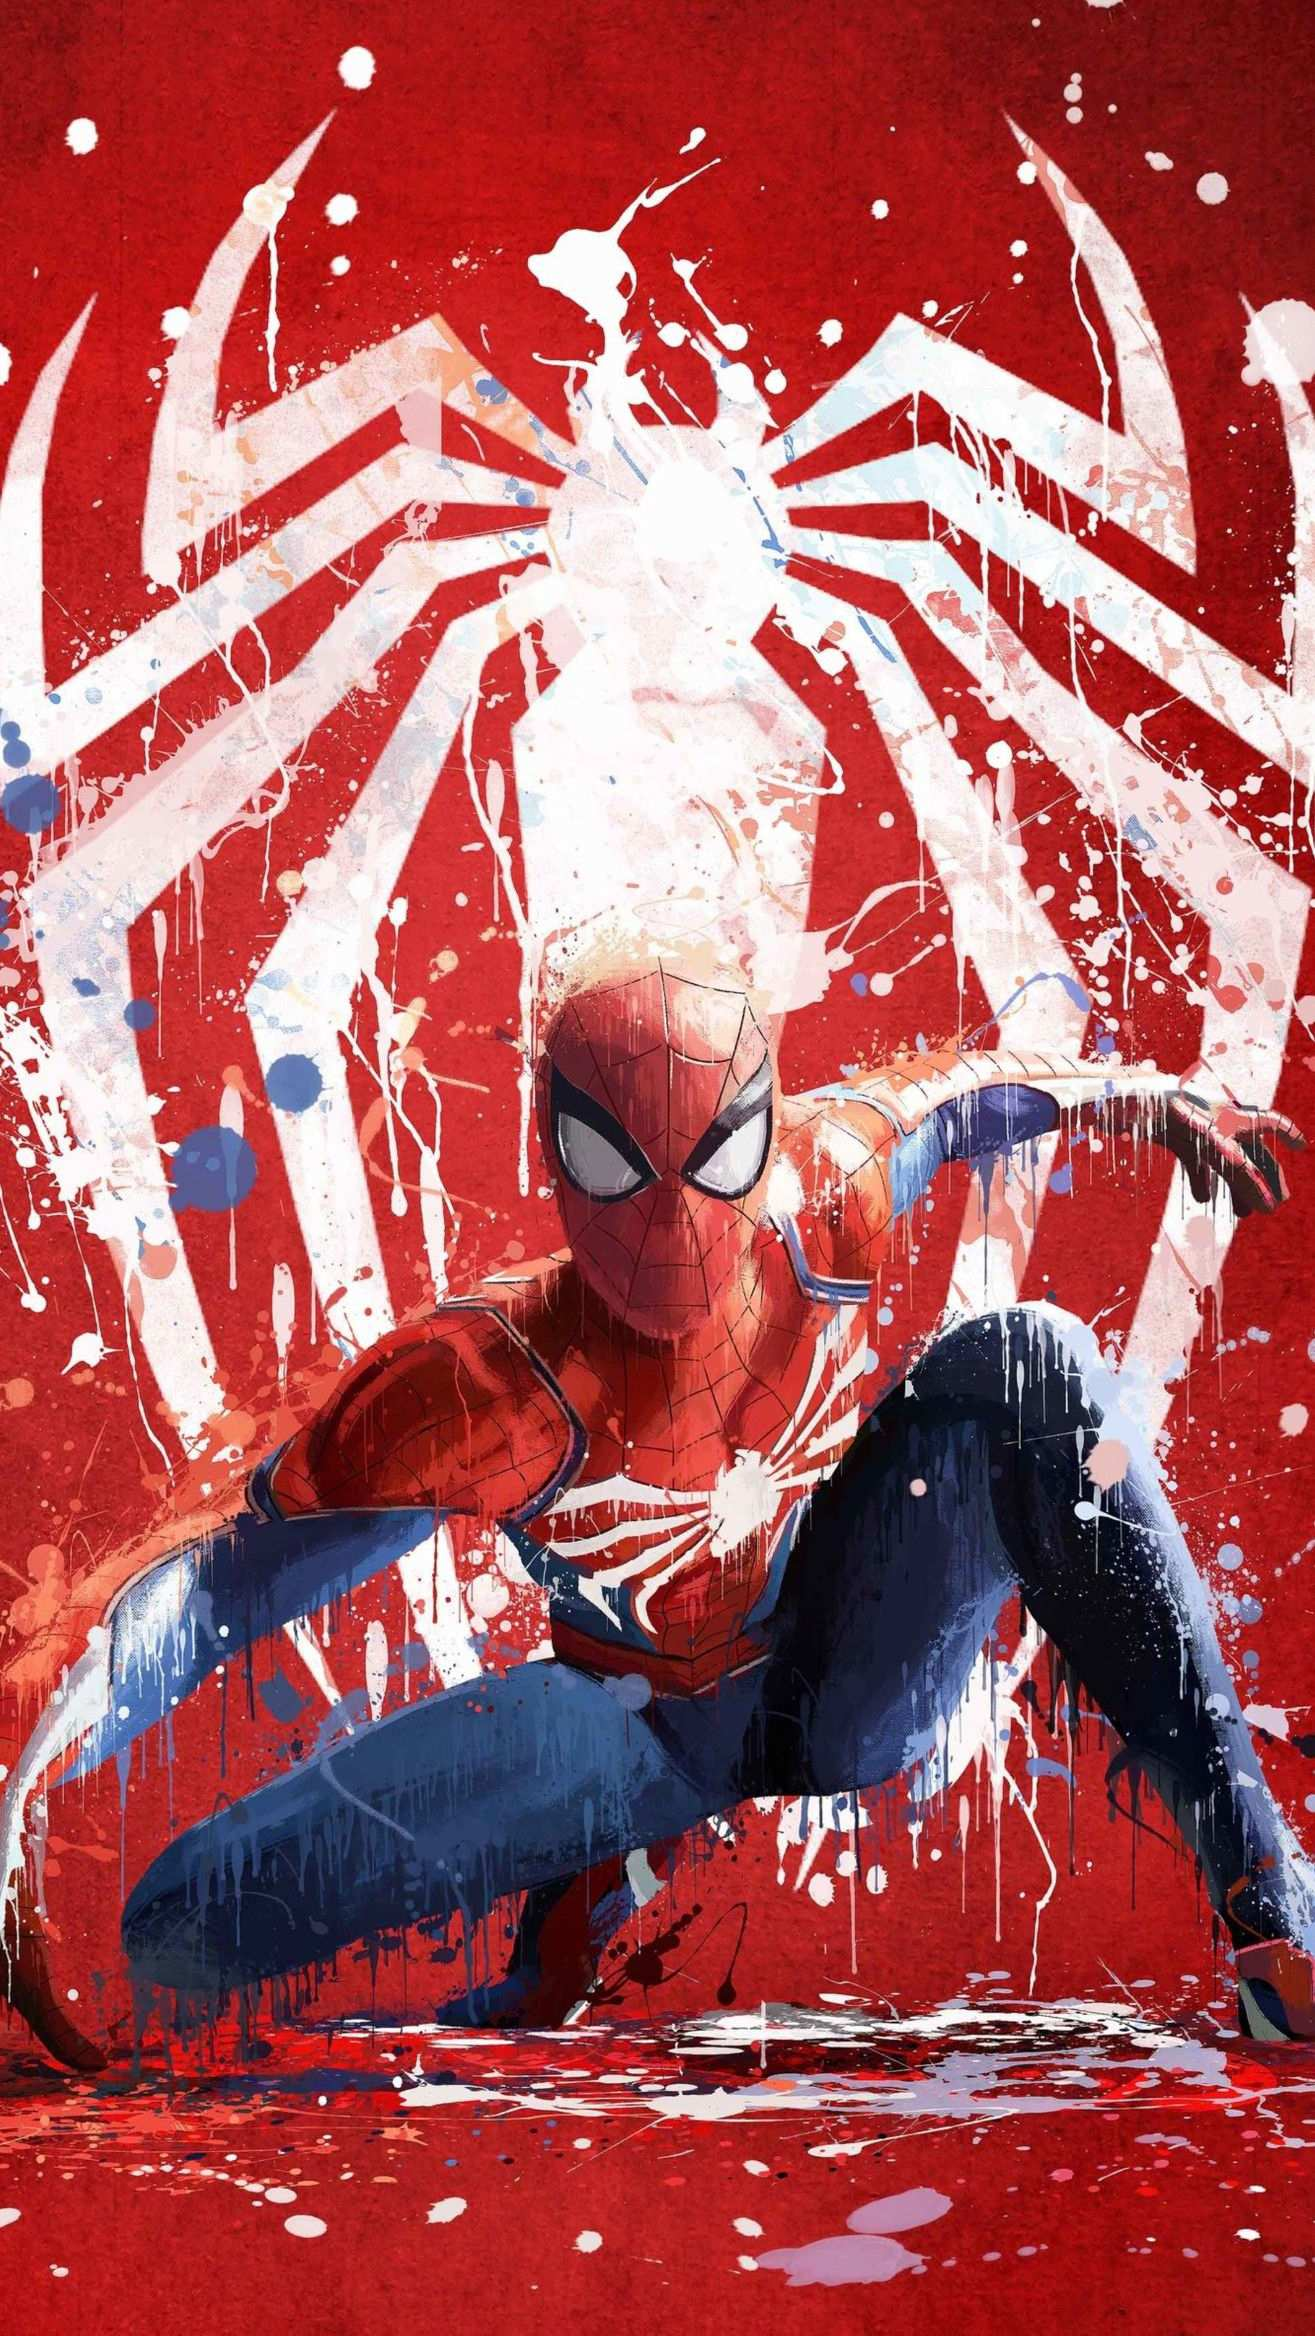 Spider Man Movie Poster Art iPhone Wallpaper